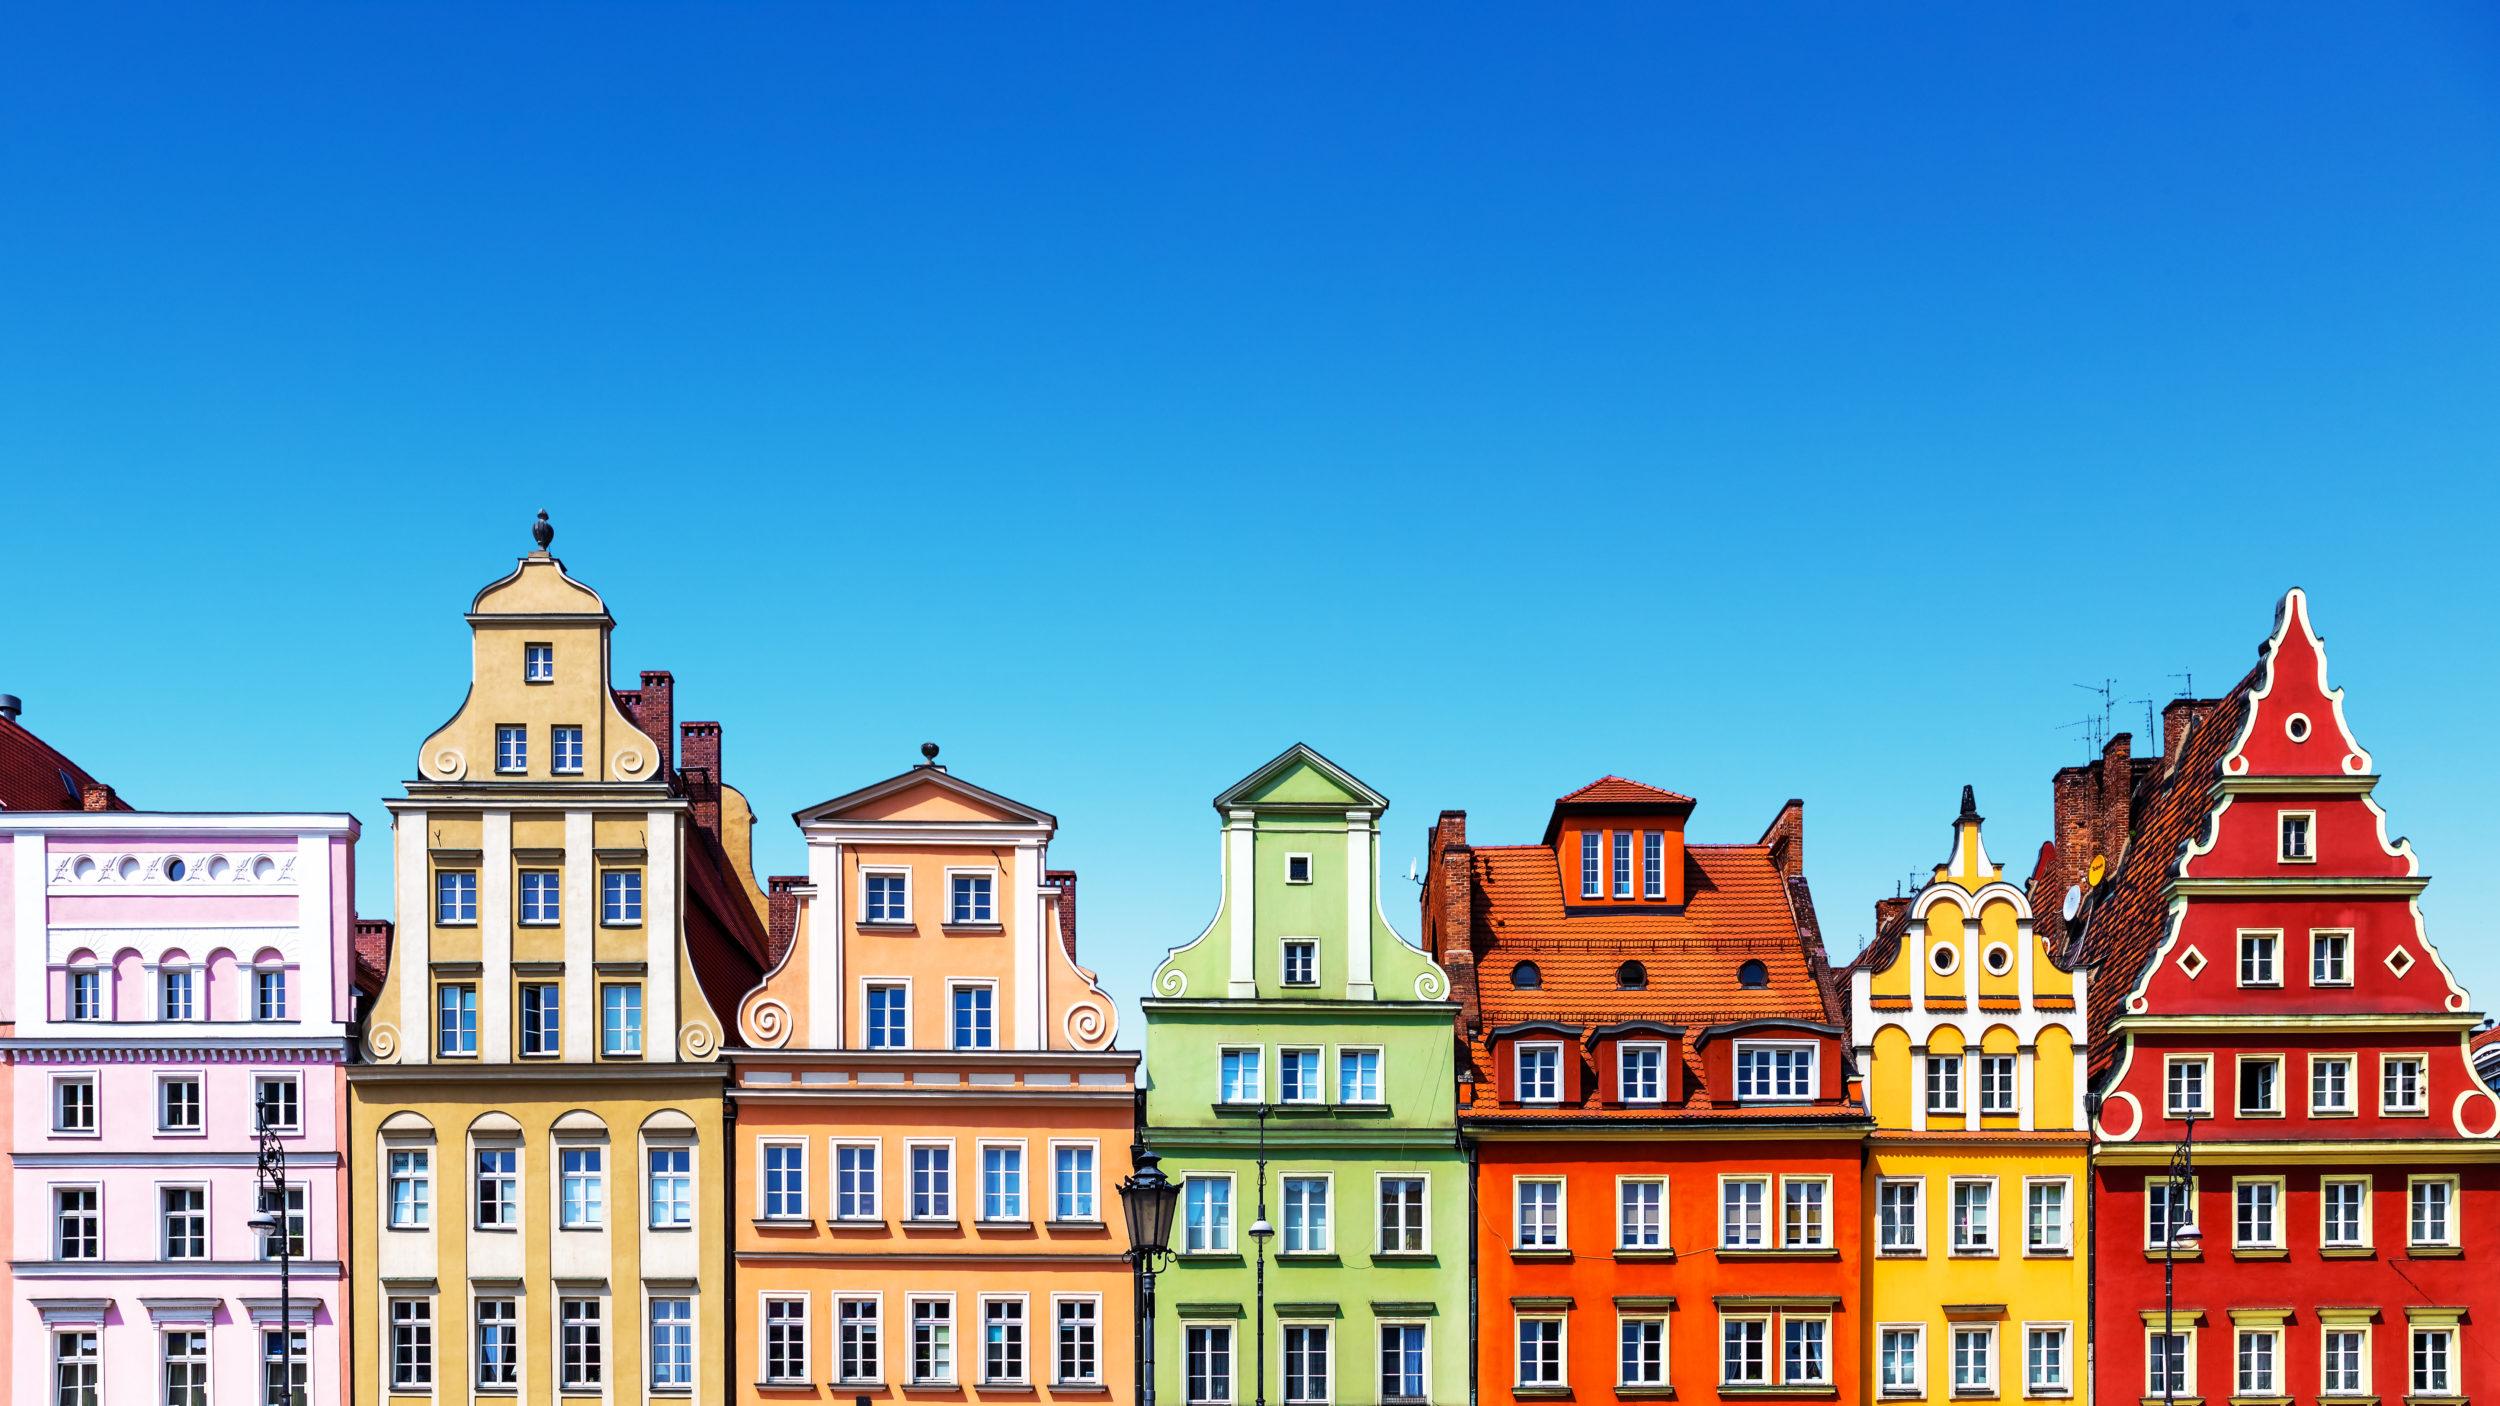 Poland [Shutterstock]